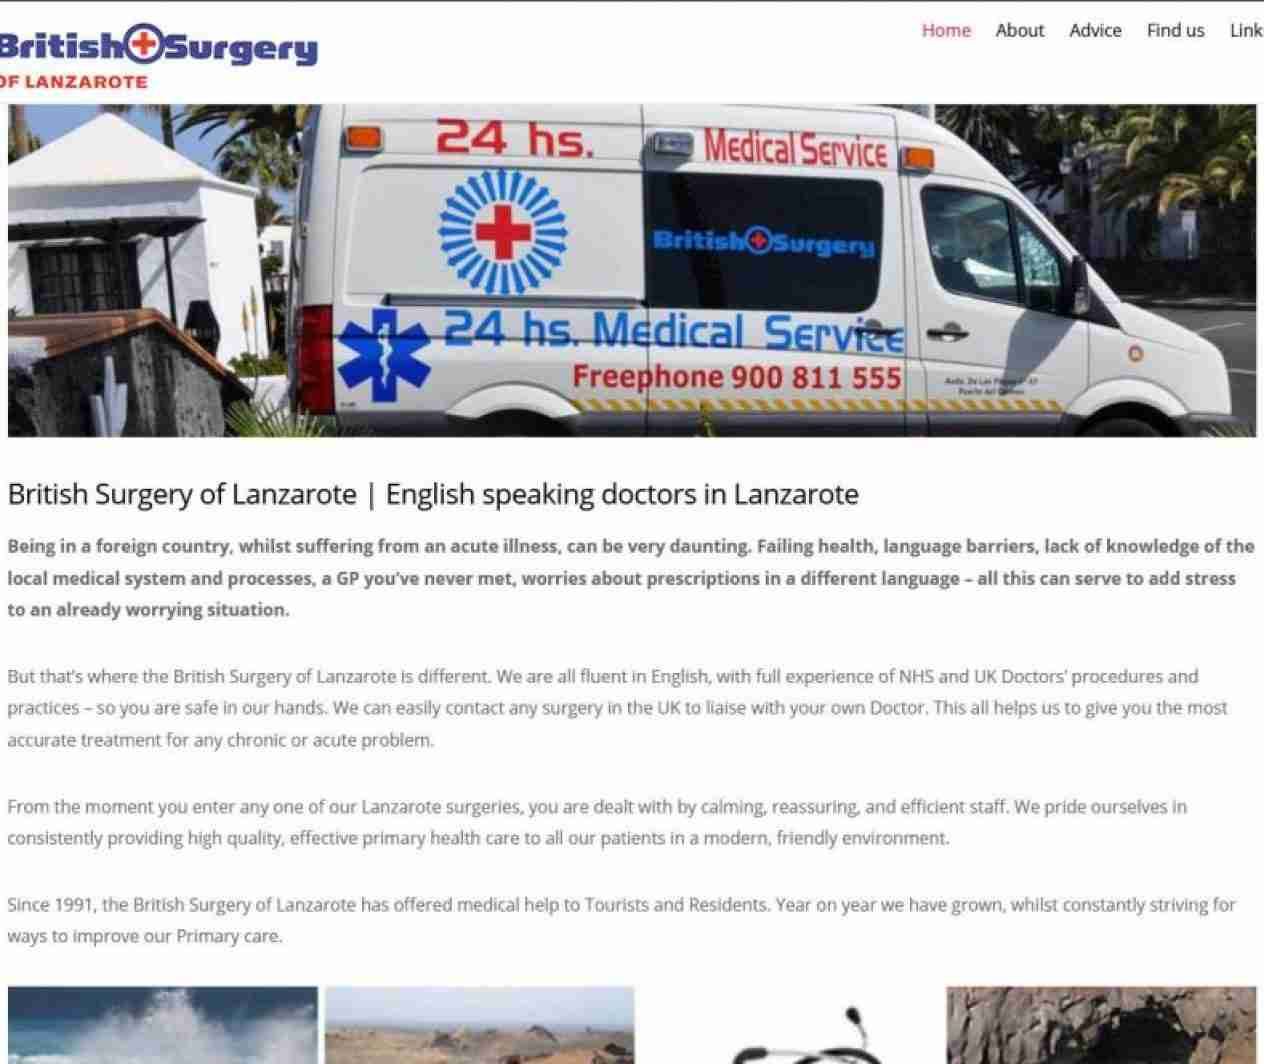 British-Surgery-of-Lanzarote-Screengrab